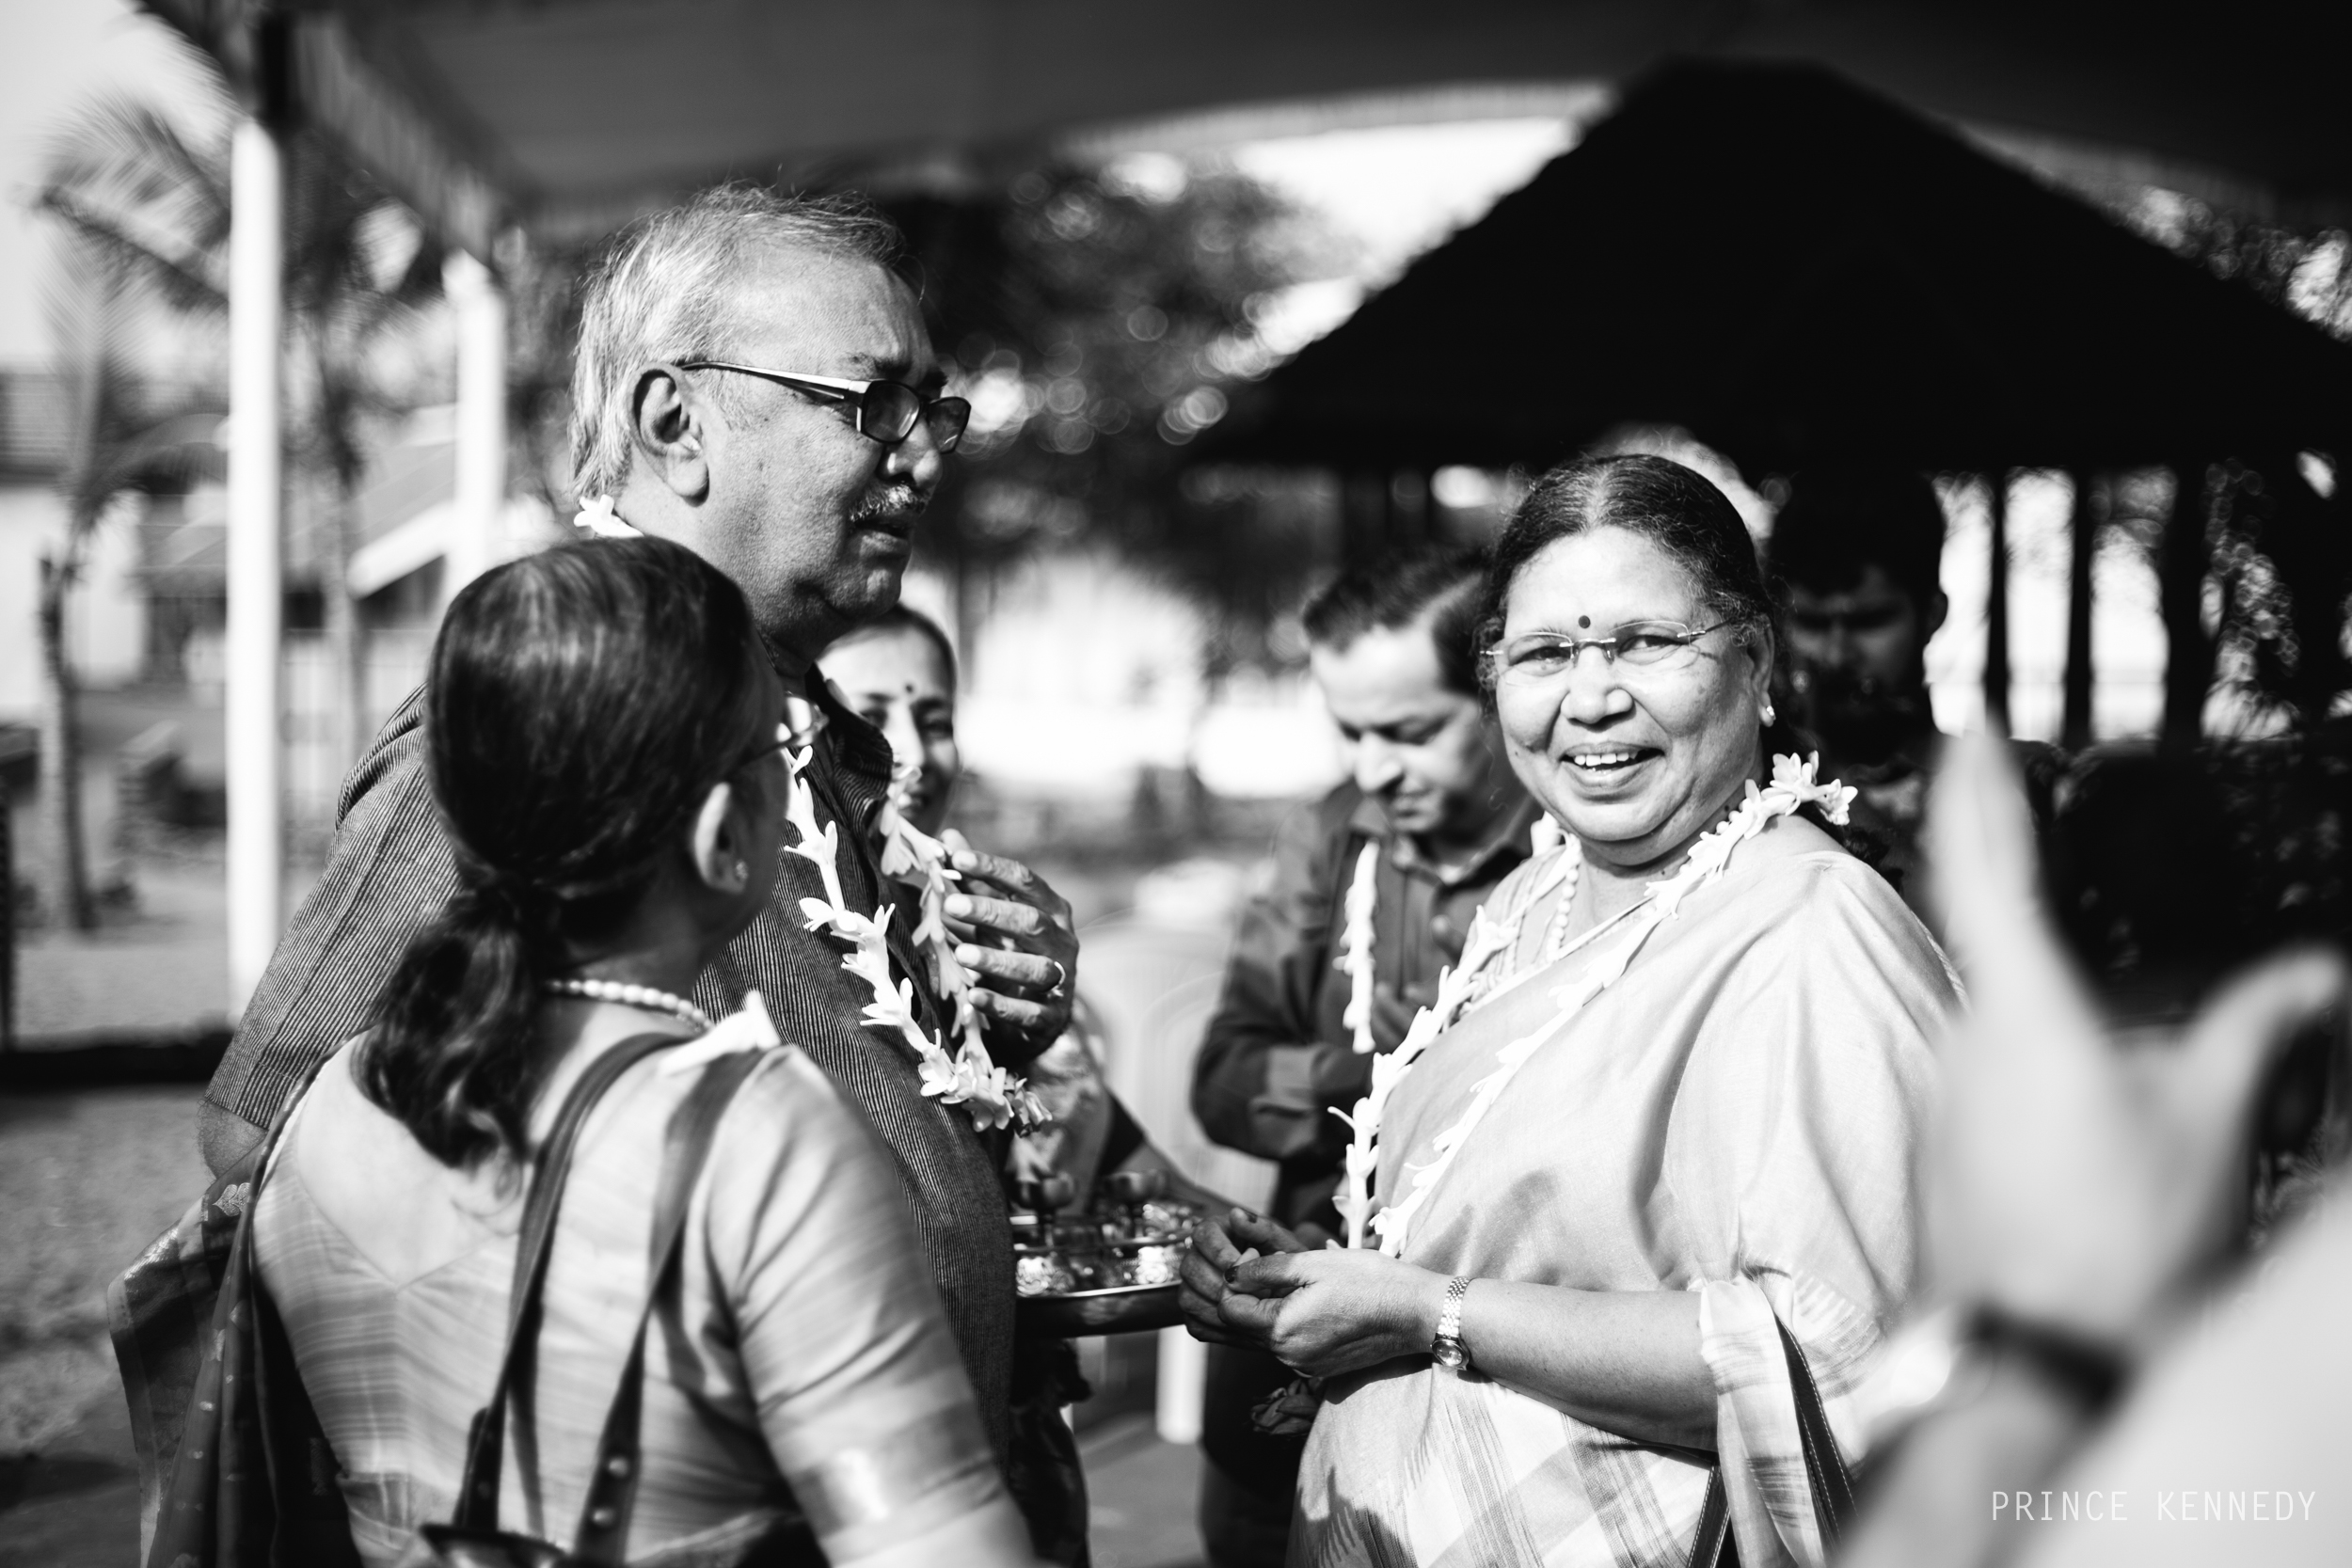 Athmajja-Nithesh-Engagement-Couple-Portrait-Portraiture-Wedding-Couple-Portrait-Chennai-Photographer-Candid-Photography-Destination-Best-Prince-Kennedy-Photography-118.jpg